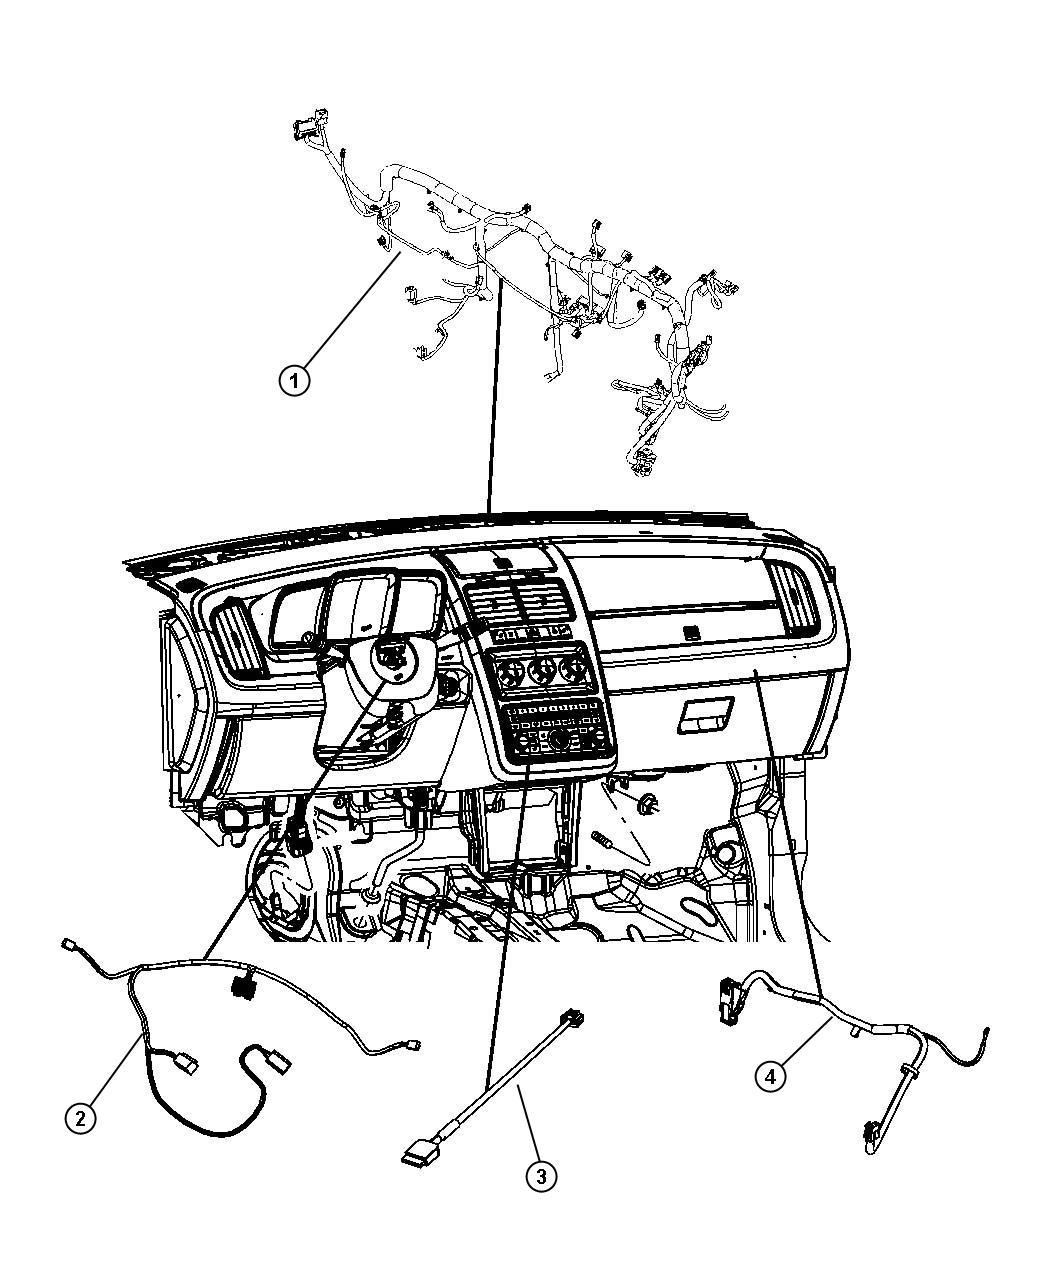 Dodge Journey Wiring. Instrument panel. [air cond atc w